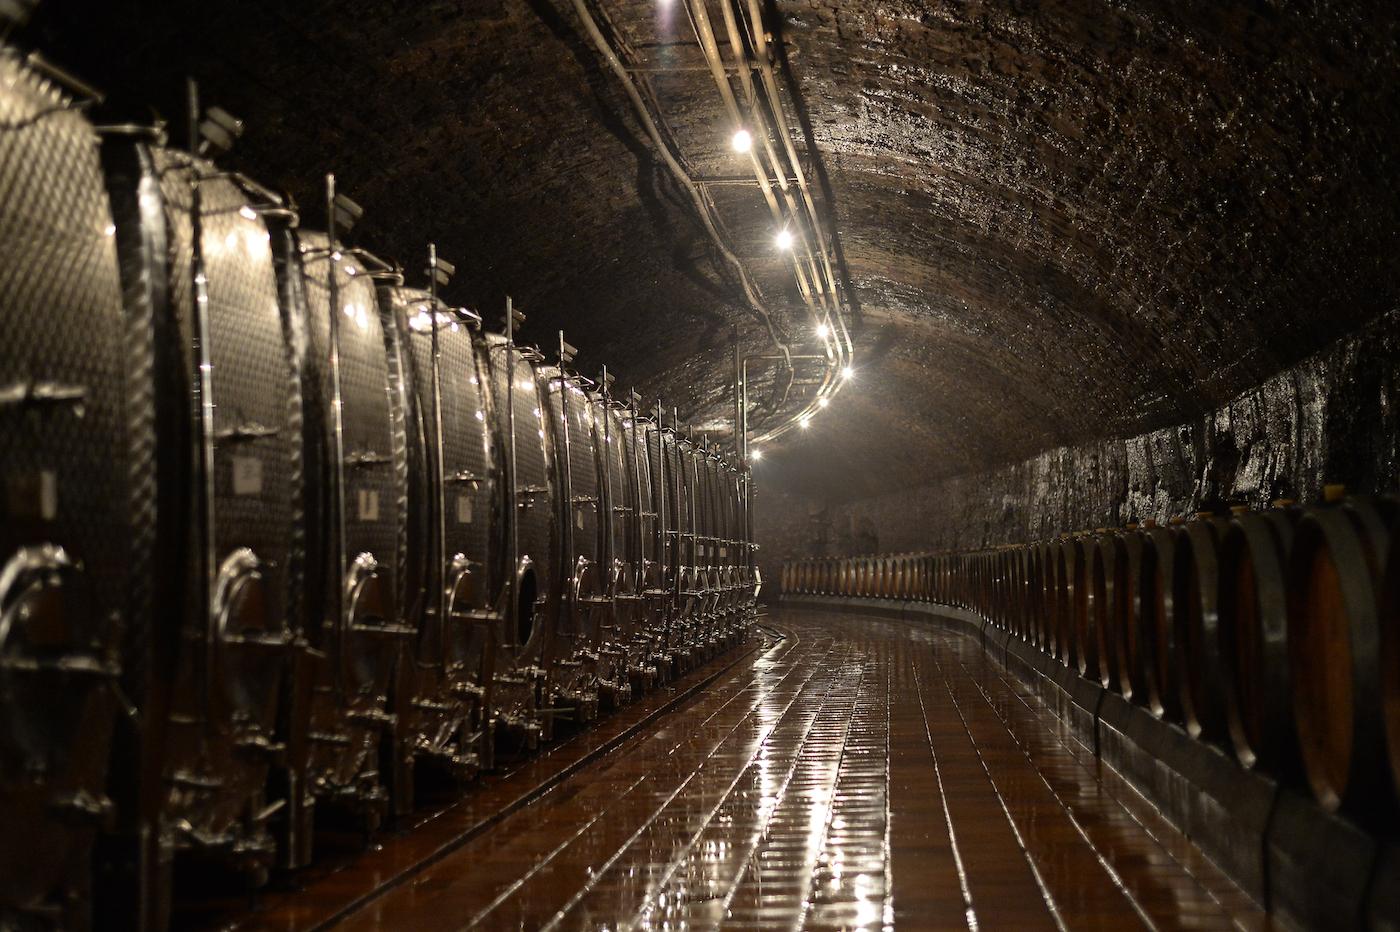 Le Caves Saint Martin - foto Jonathan Godin/LFT